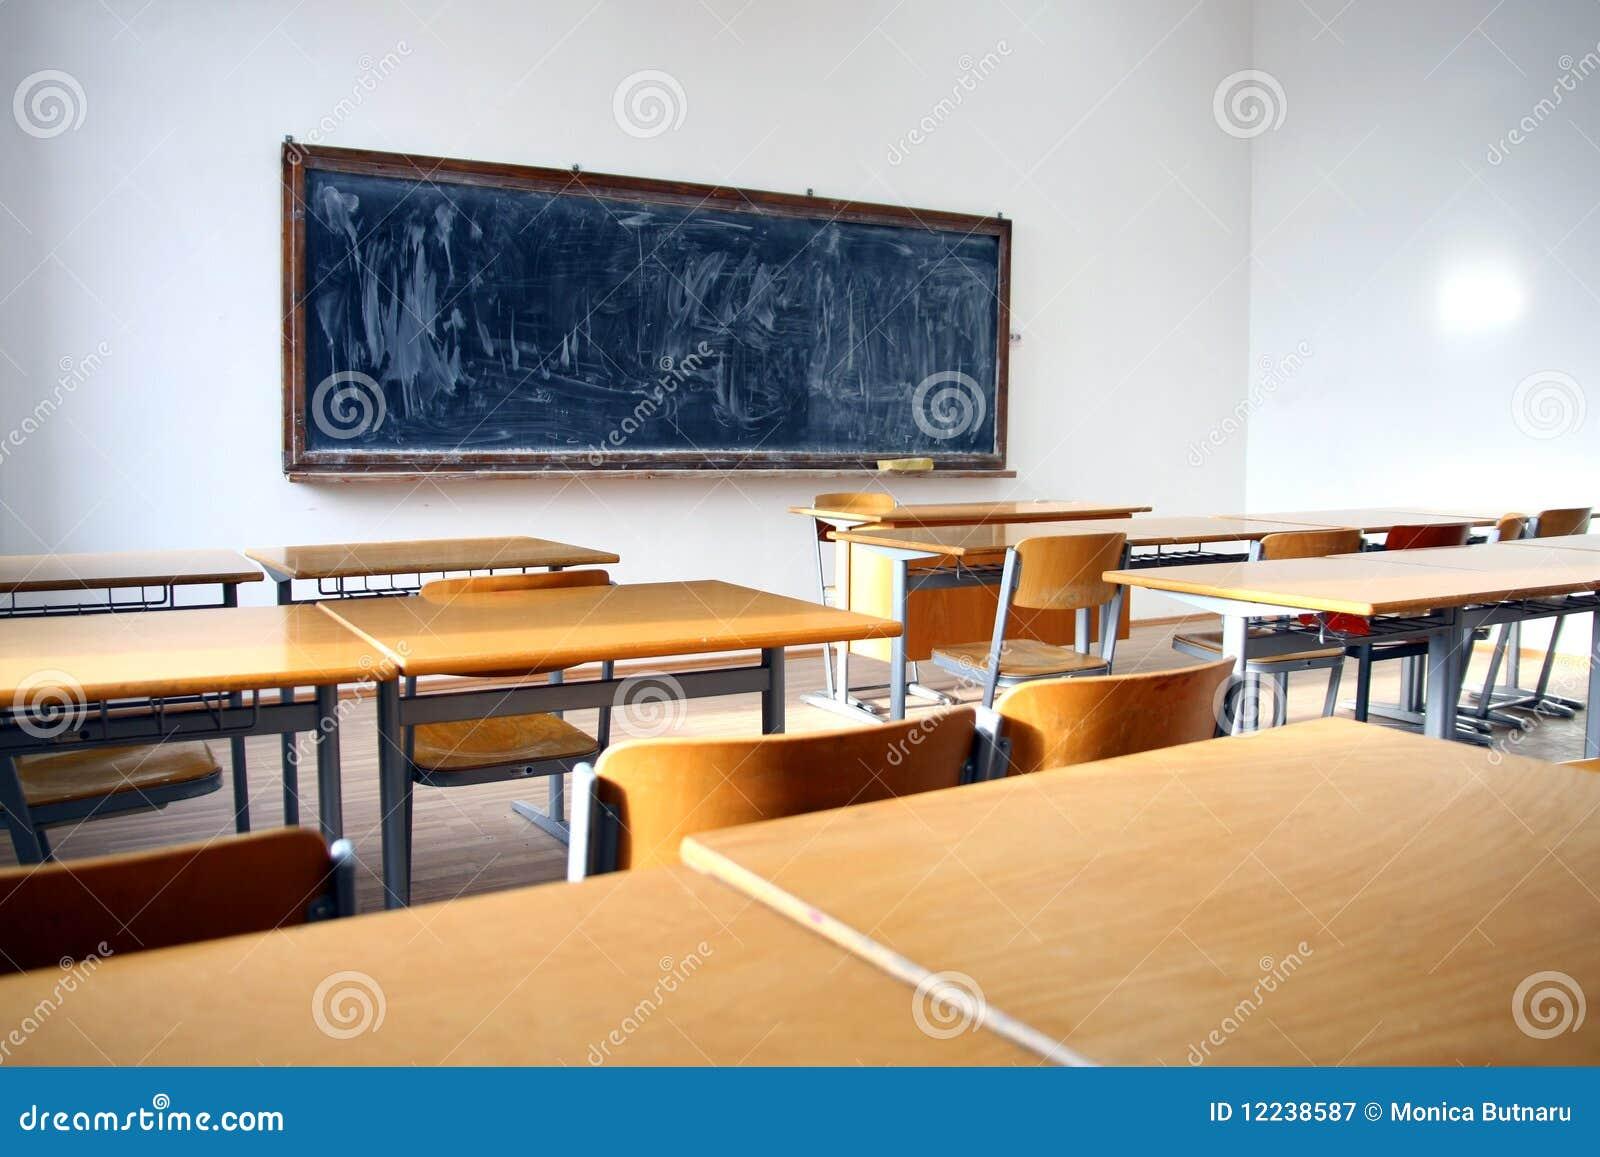 Classroom Blackboard Design ~ Traditional classroom interior with blackboard royalty